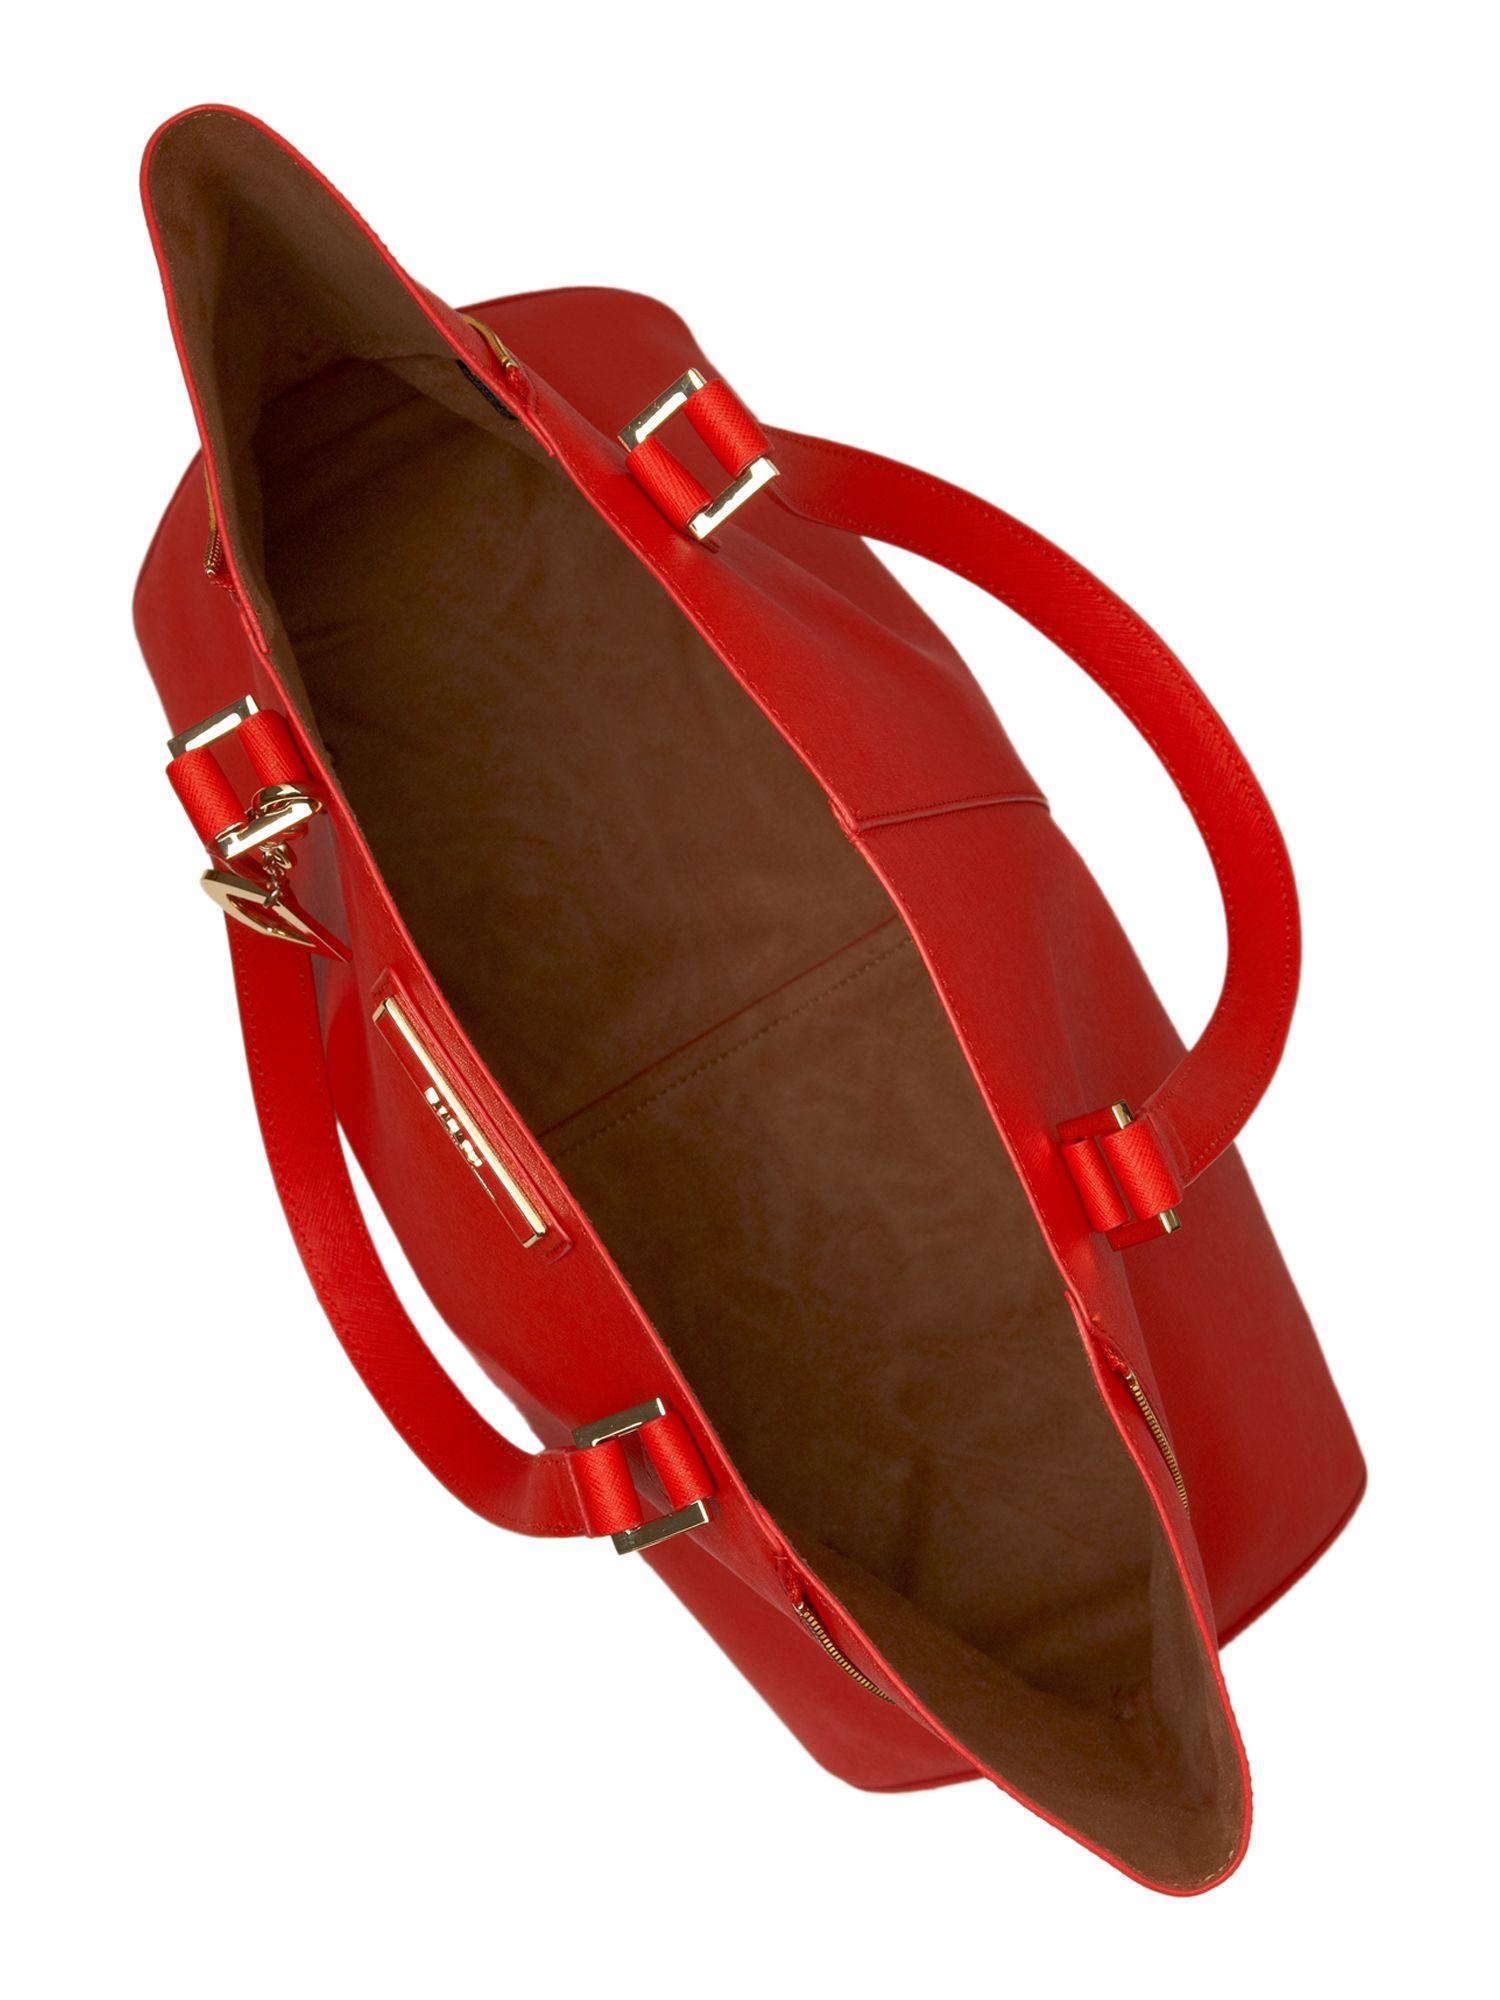 DKNY Saffiano Large Tote Bag in Orange